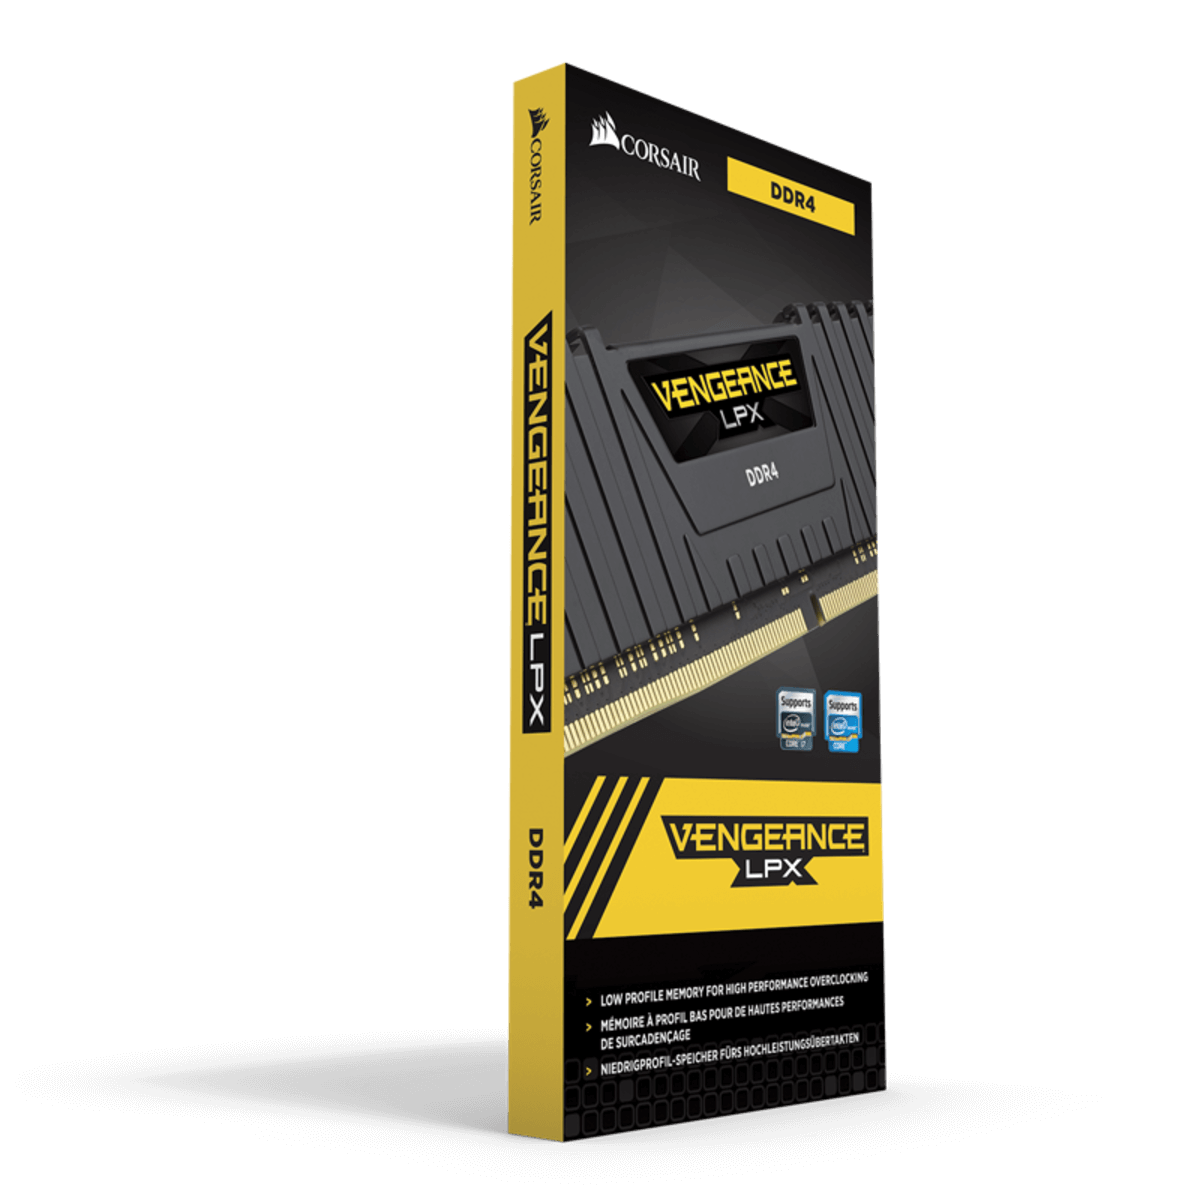 Memória Corsair Vengeance LPX 8GB DDR4 3000Mhz Preta - CMK8GX4M1C3000C16